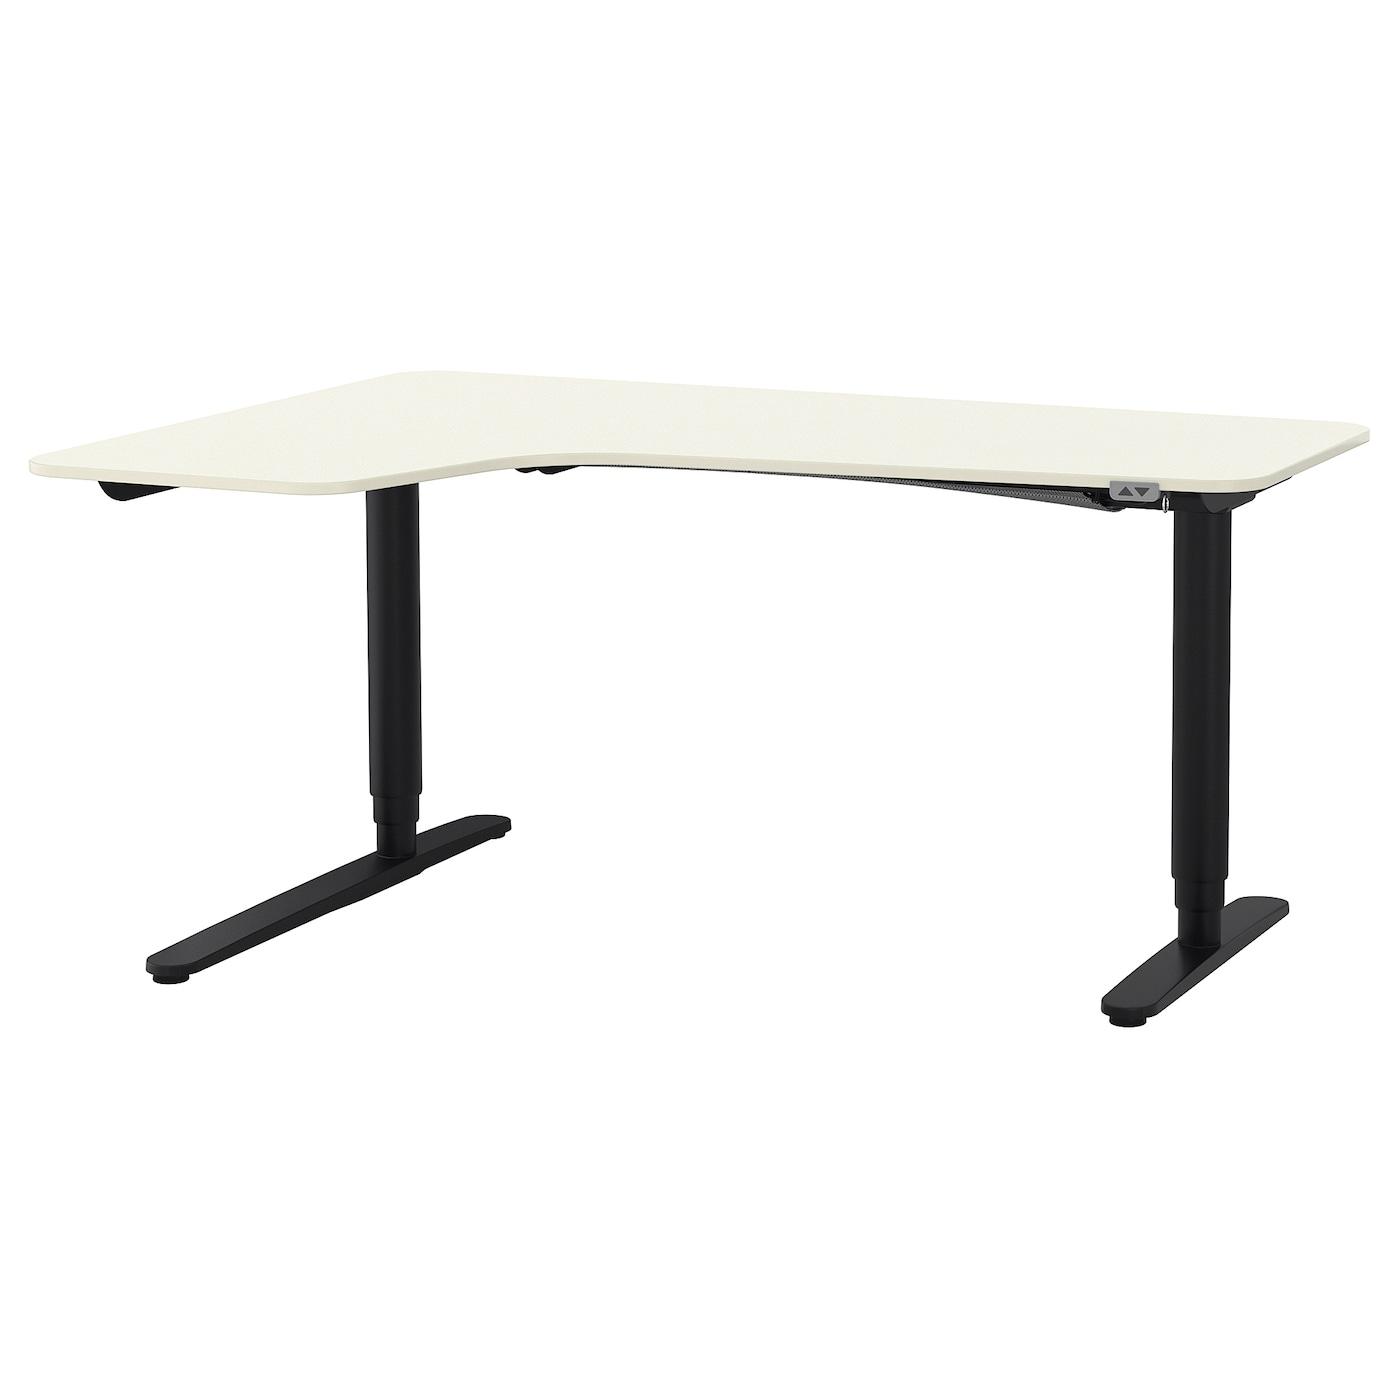 Desks - IKEA